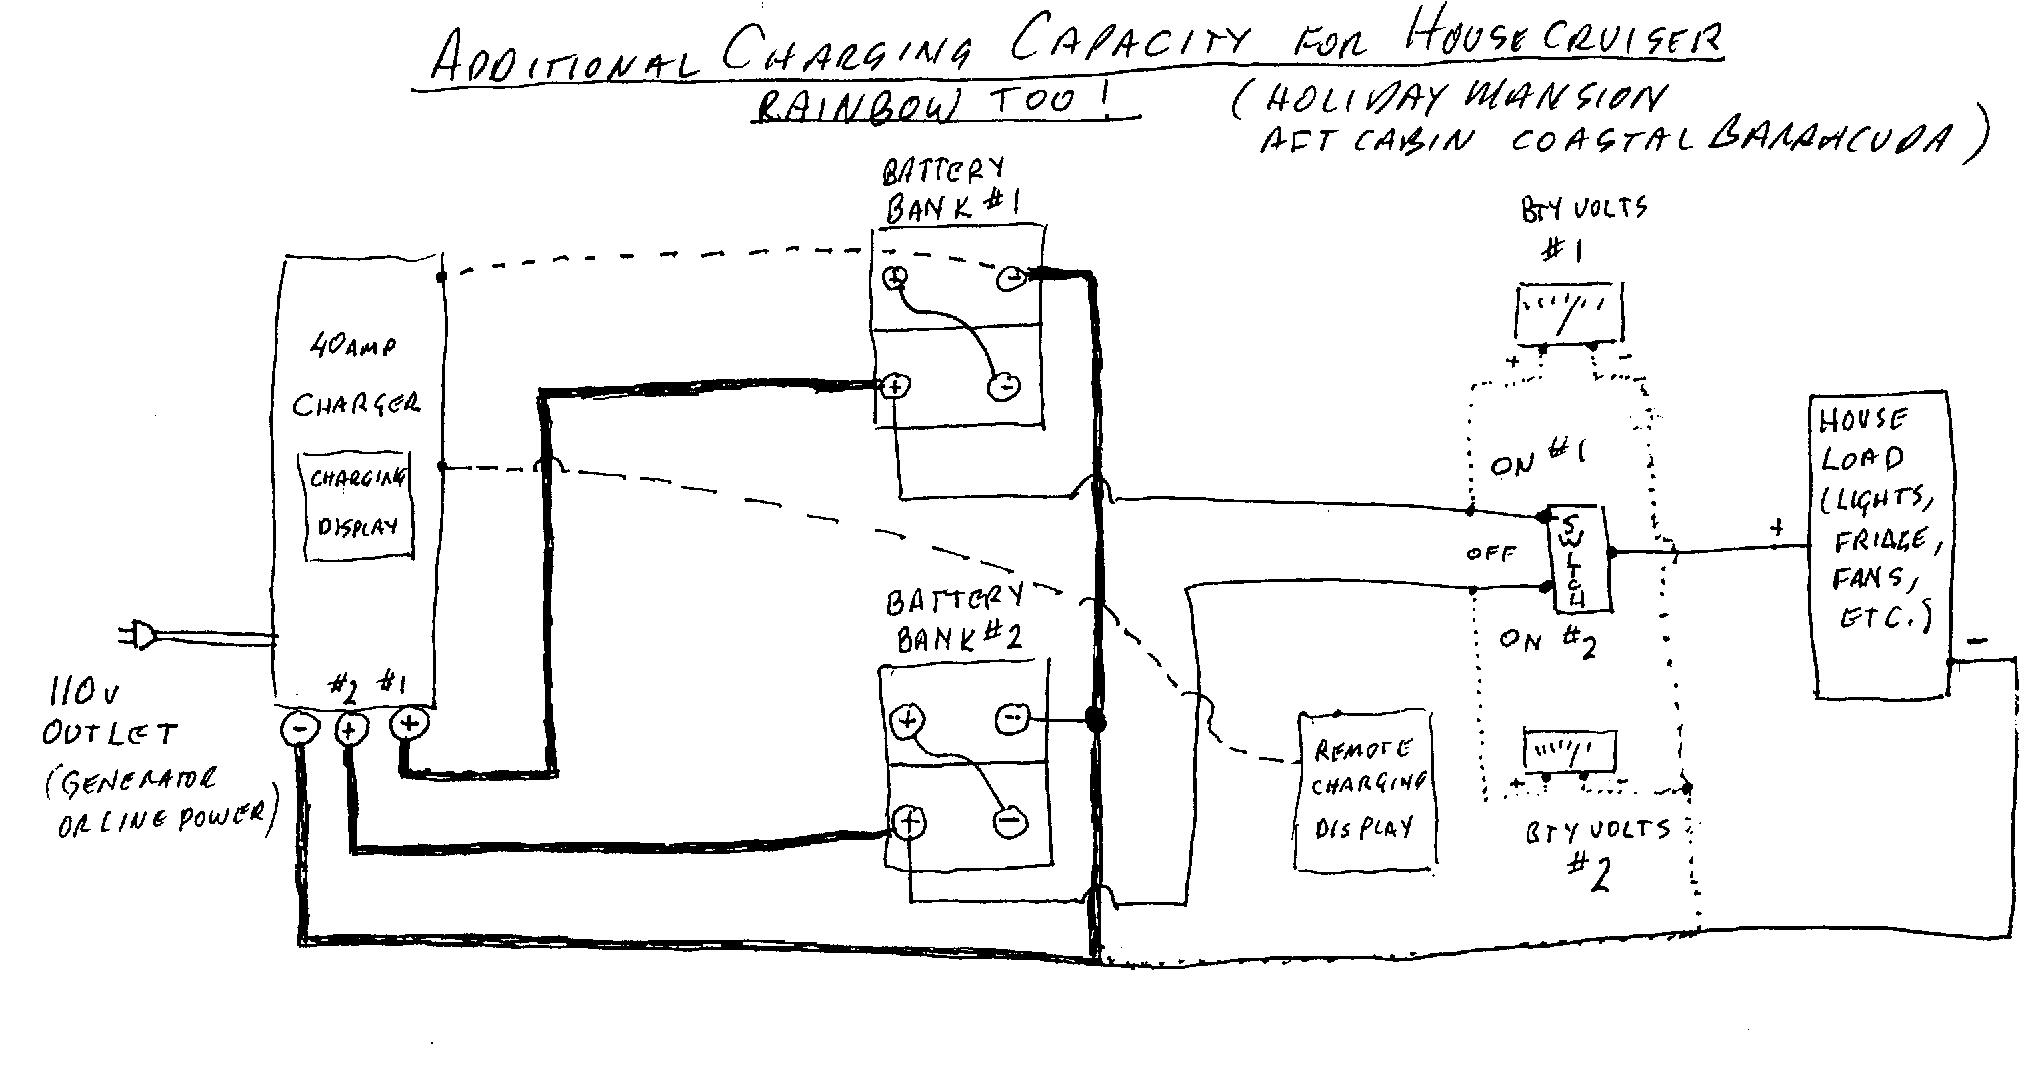 05 fleetwood southwind radiator fans wiring diagram 51 1993 Fleetwood Prowler Wiring-Diagram Fleetwood Bounder RV Wiring Diagrams